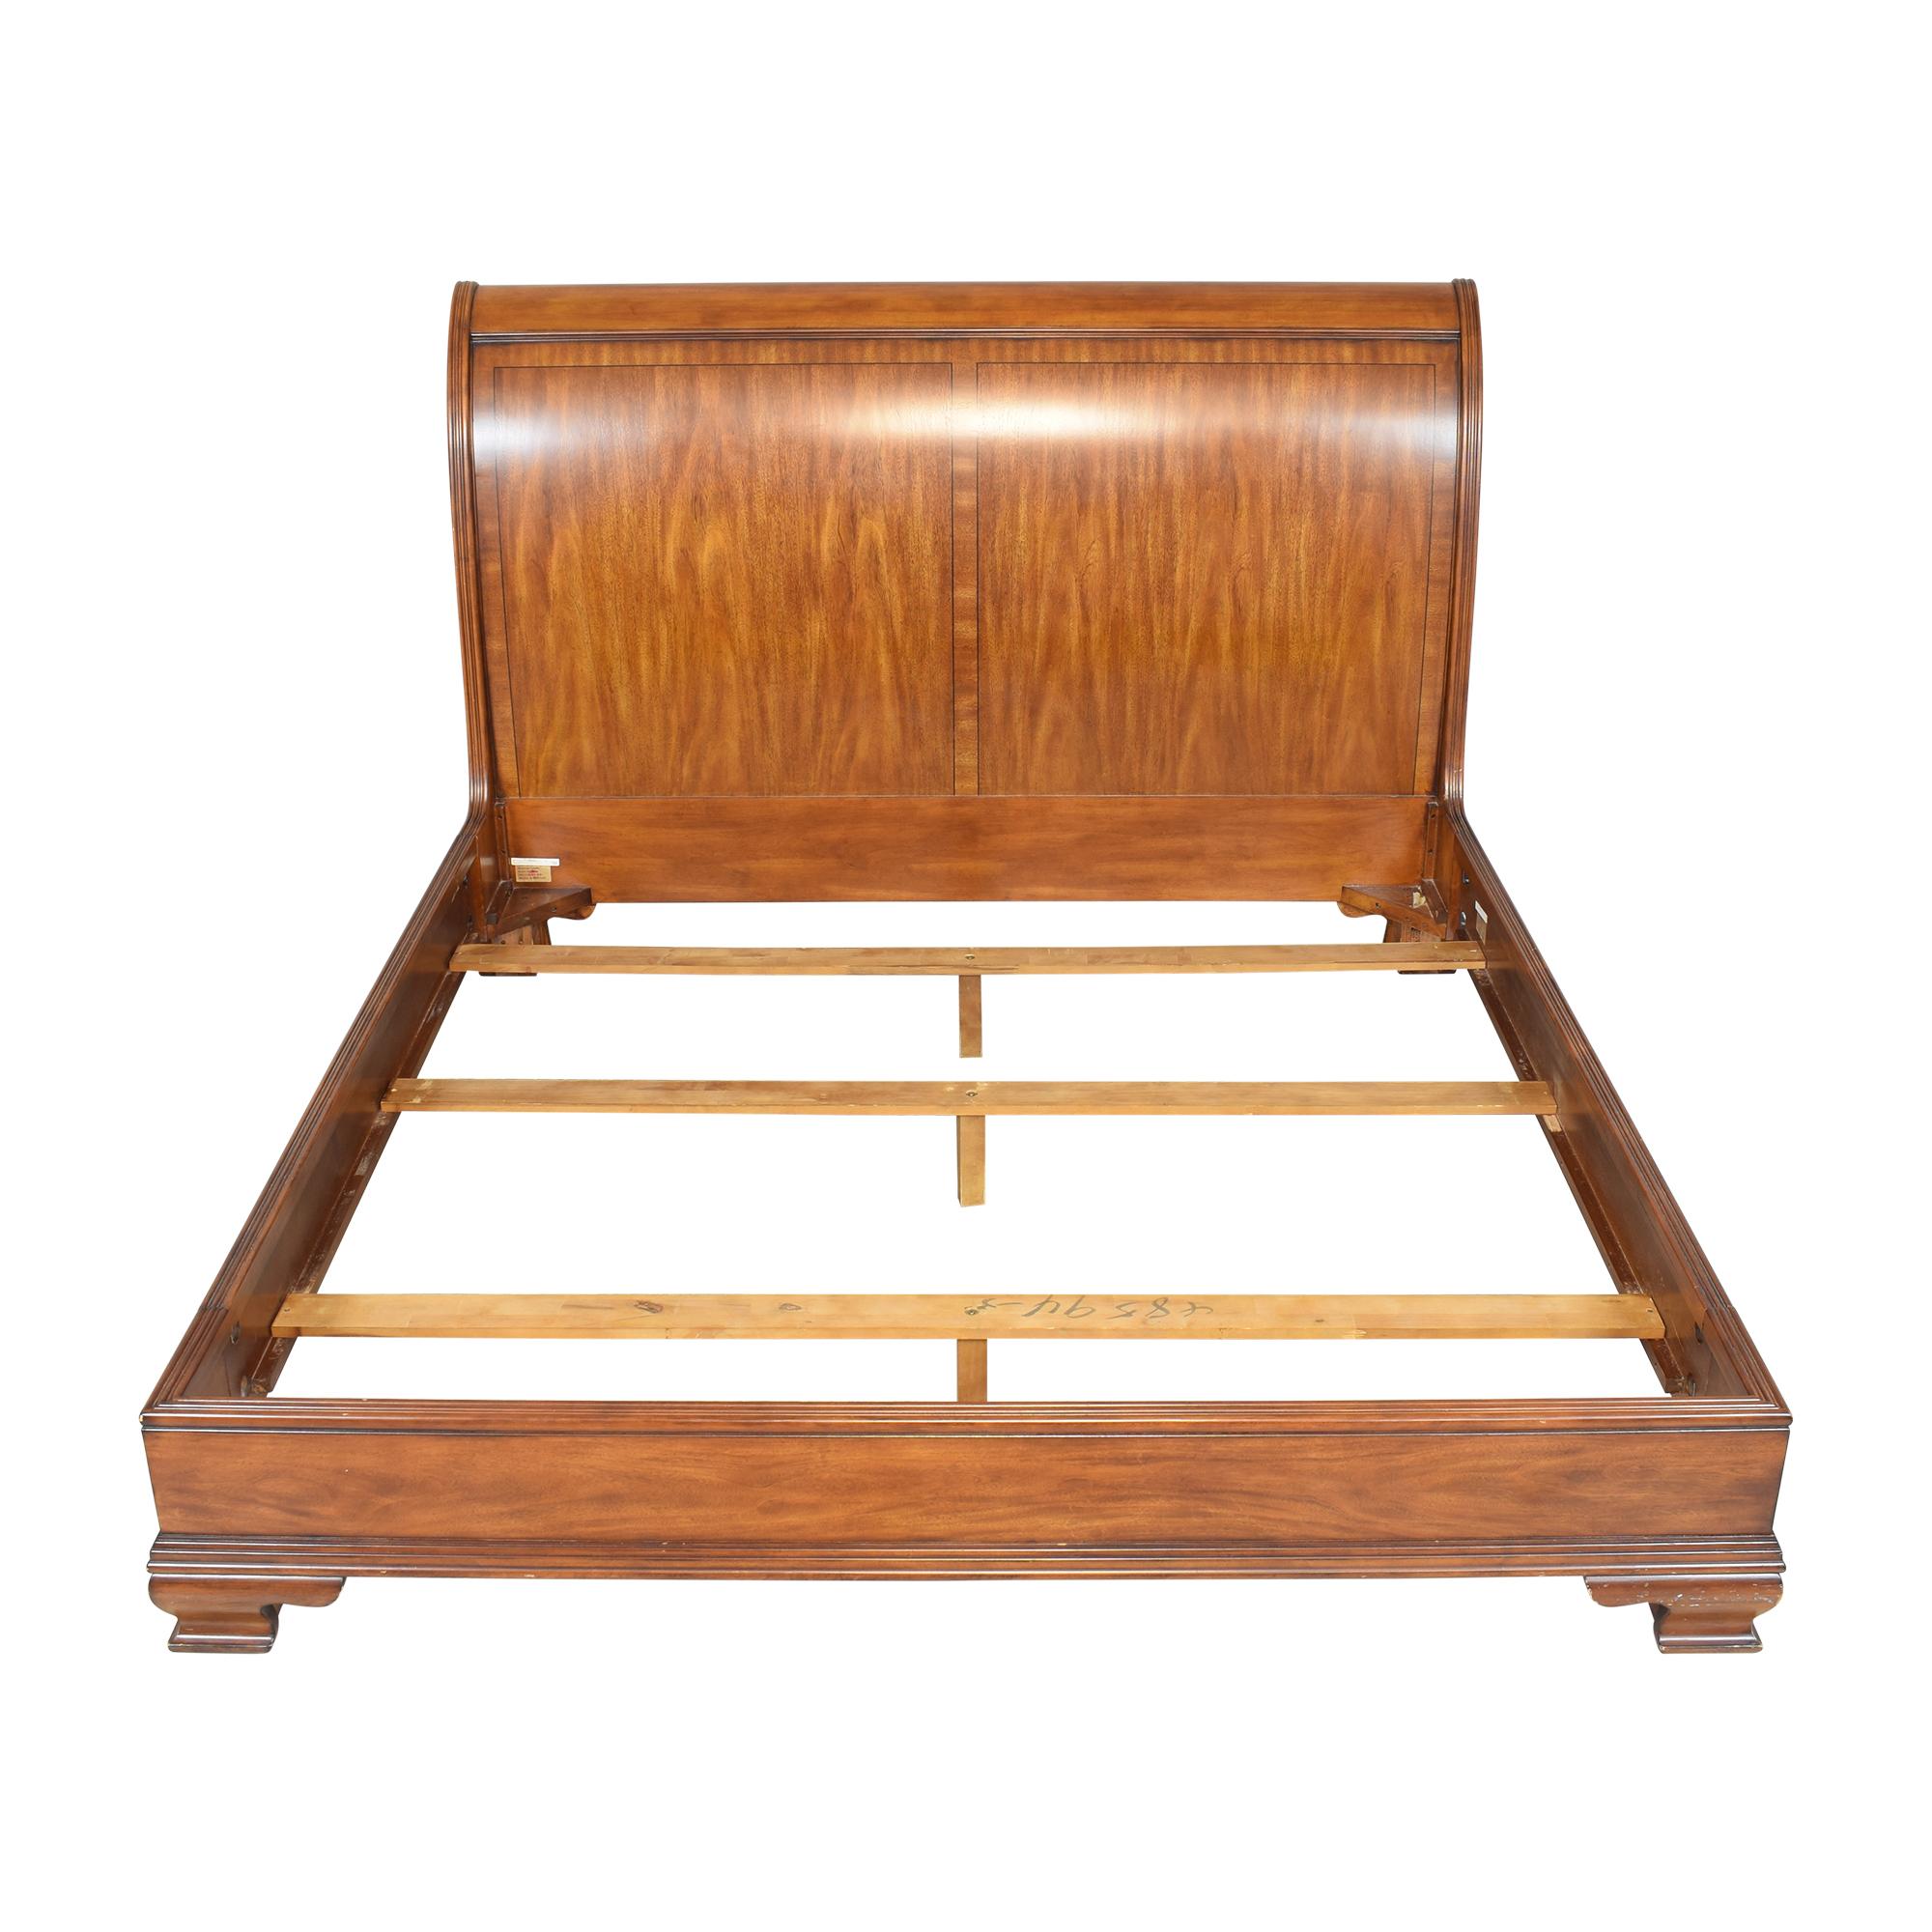 Drexel Heritage Drexel Heritage King Sleigh Bed Beds